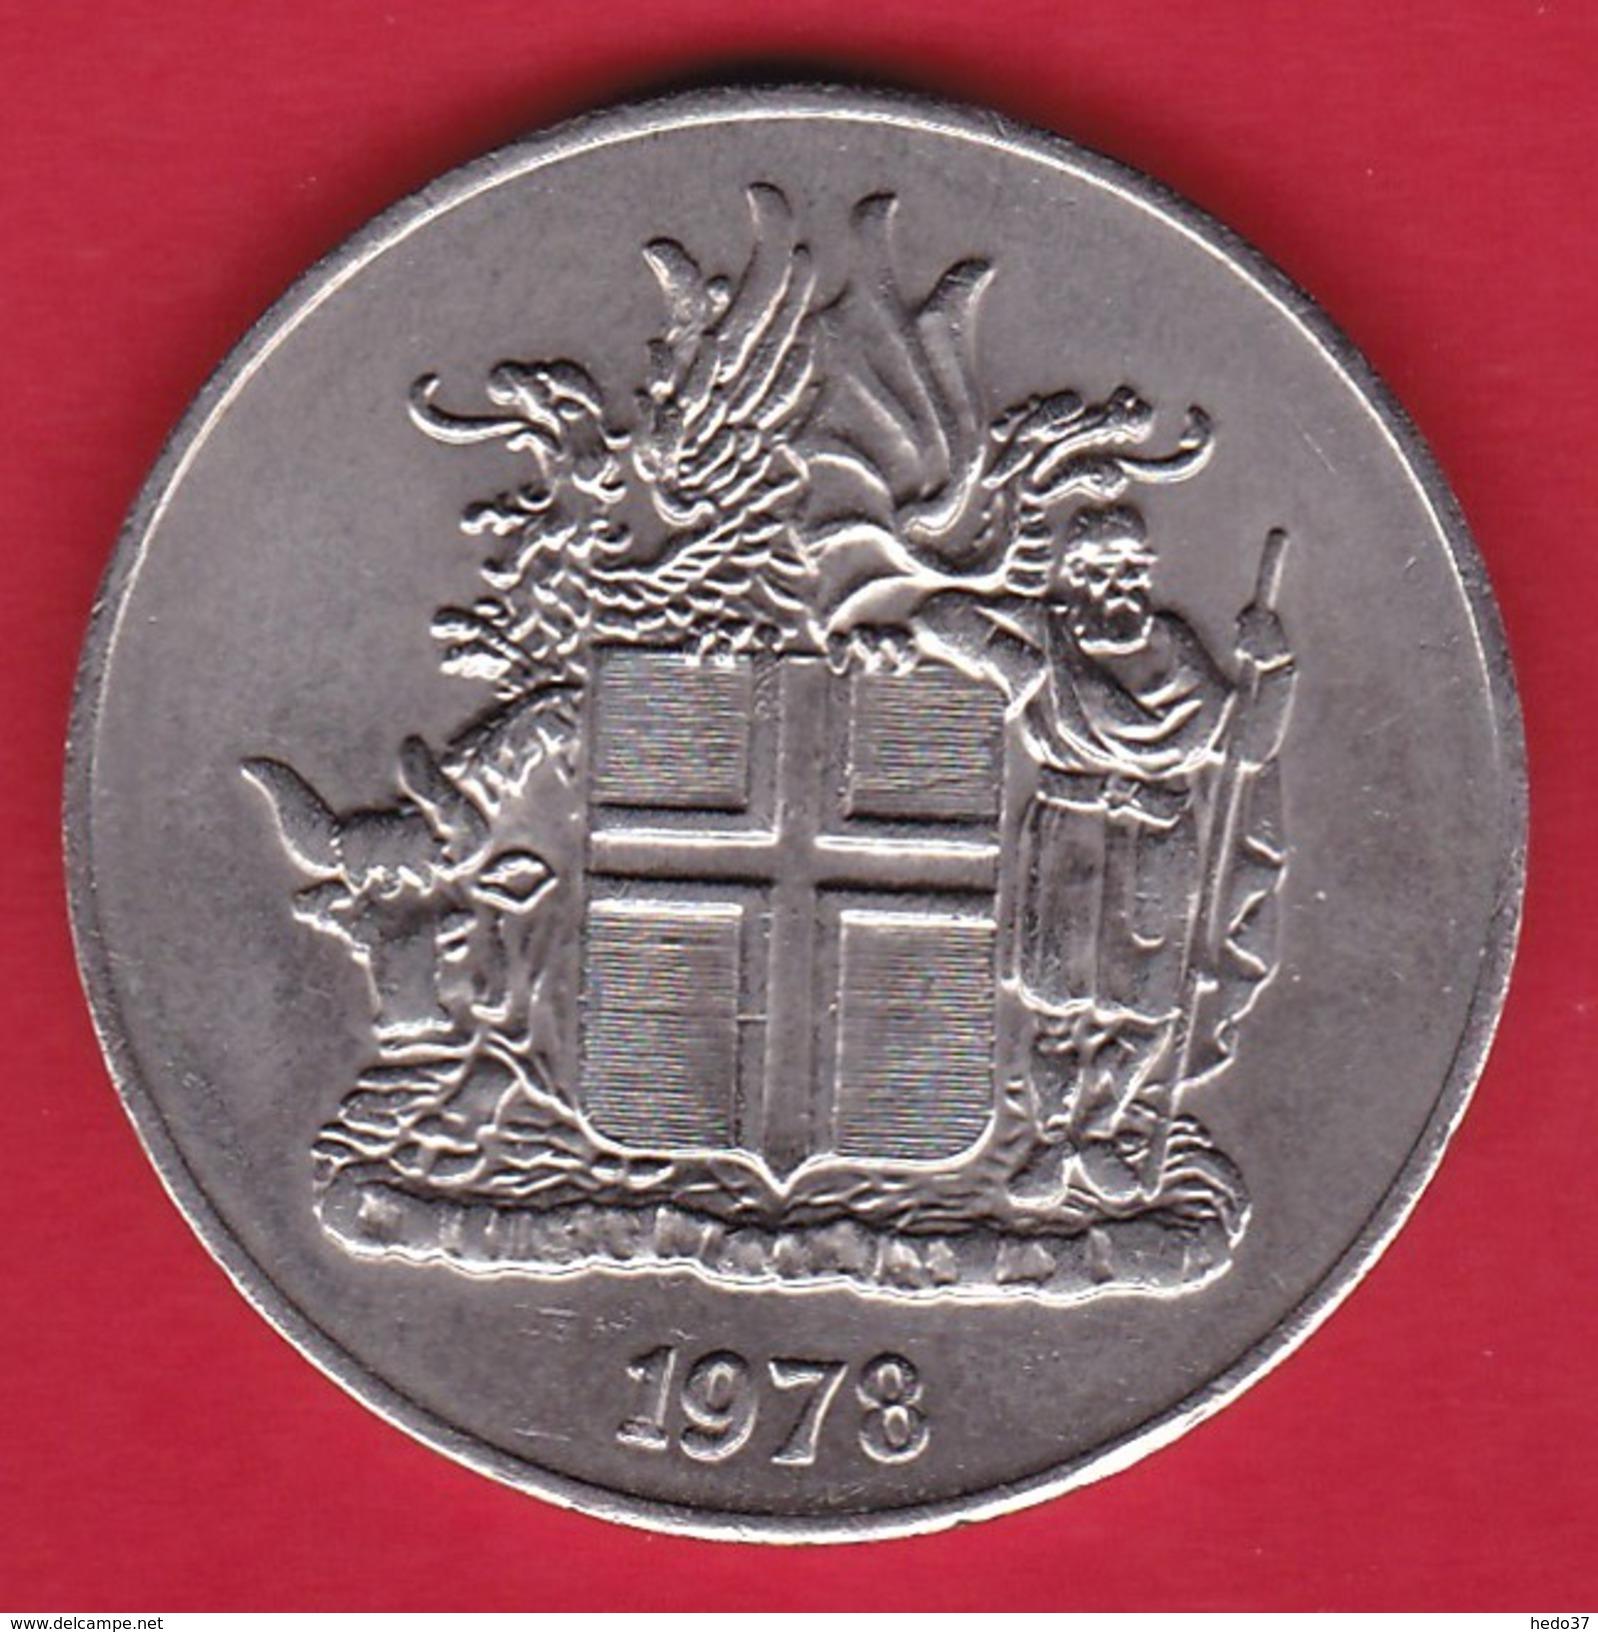 Islande - 10 Kr 1972 - Islandia